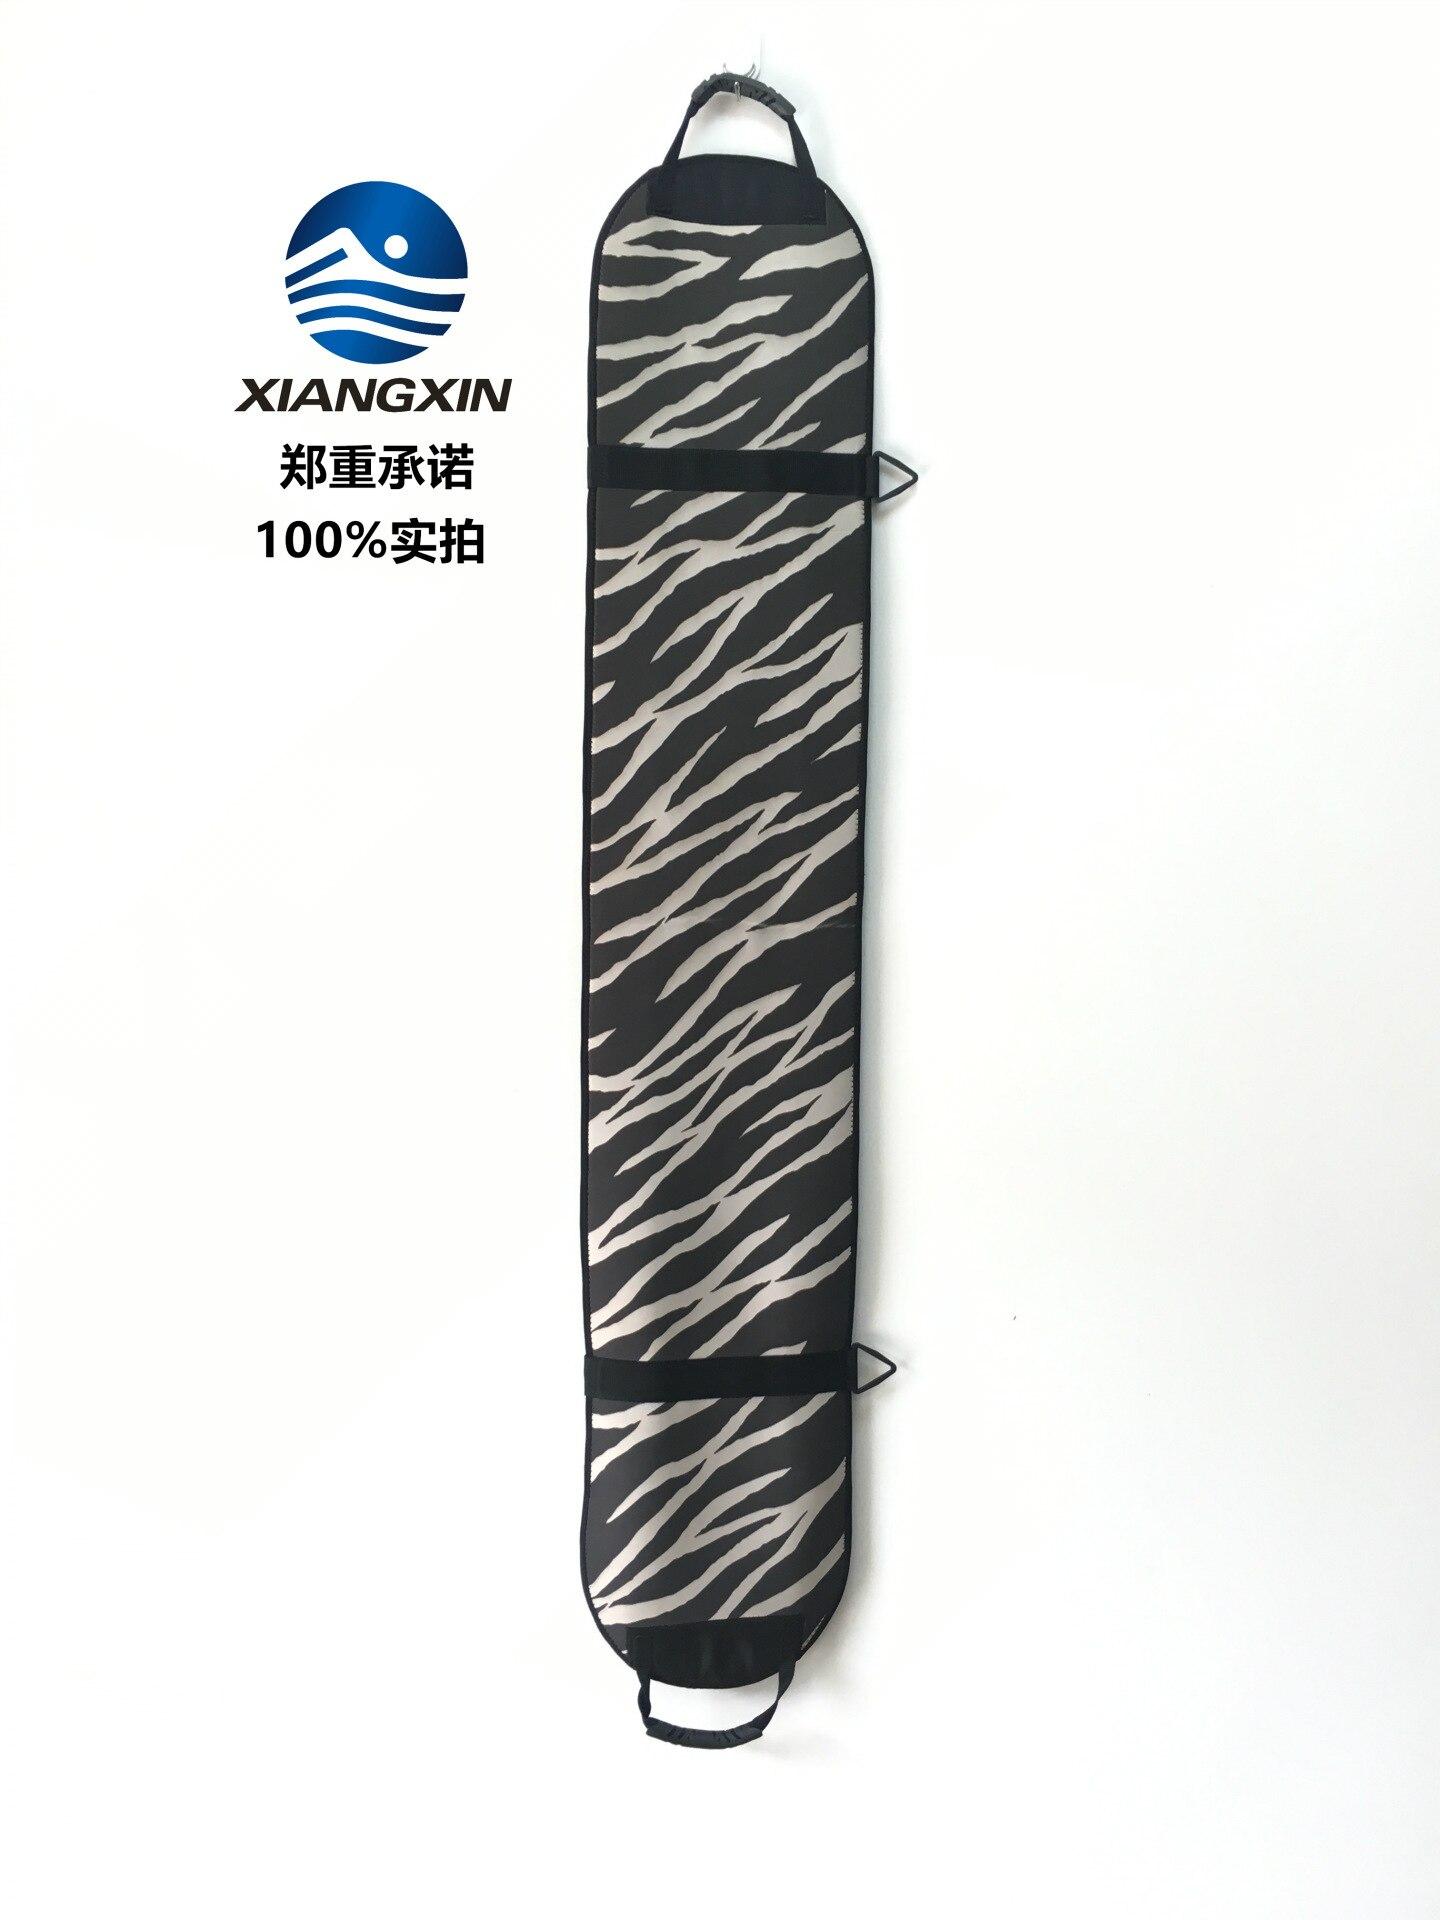 Sac de ski de plein air portable pack de ski snowboard placage fournitures de ski A5212